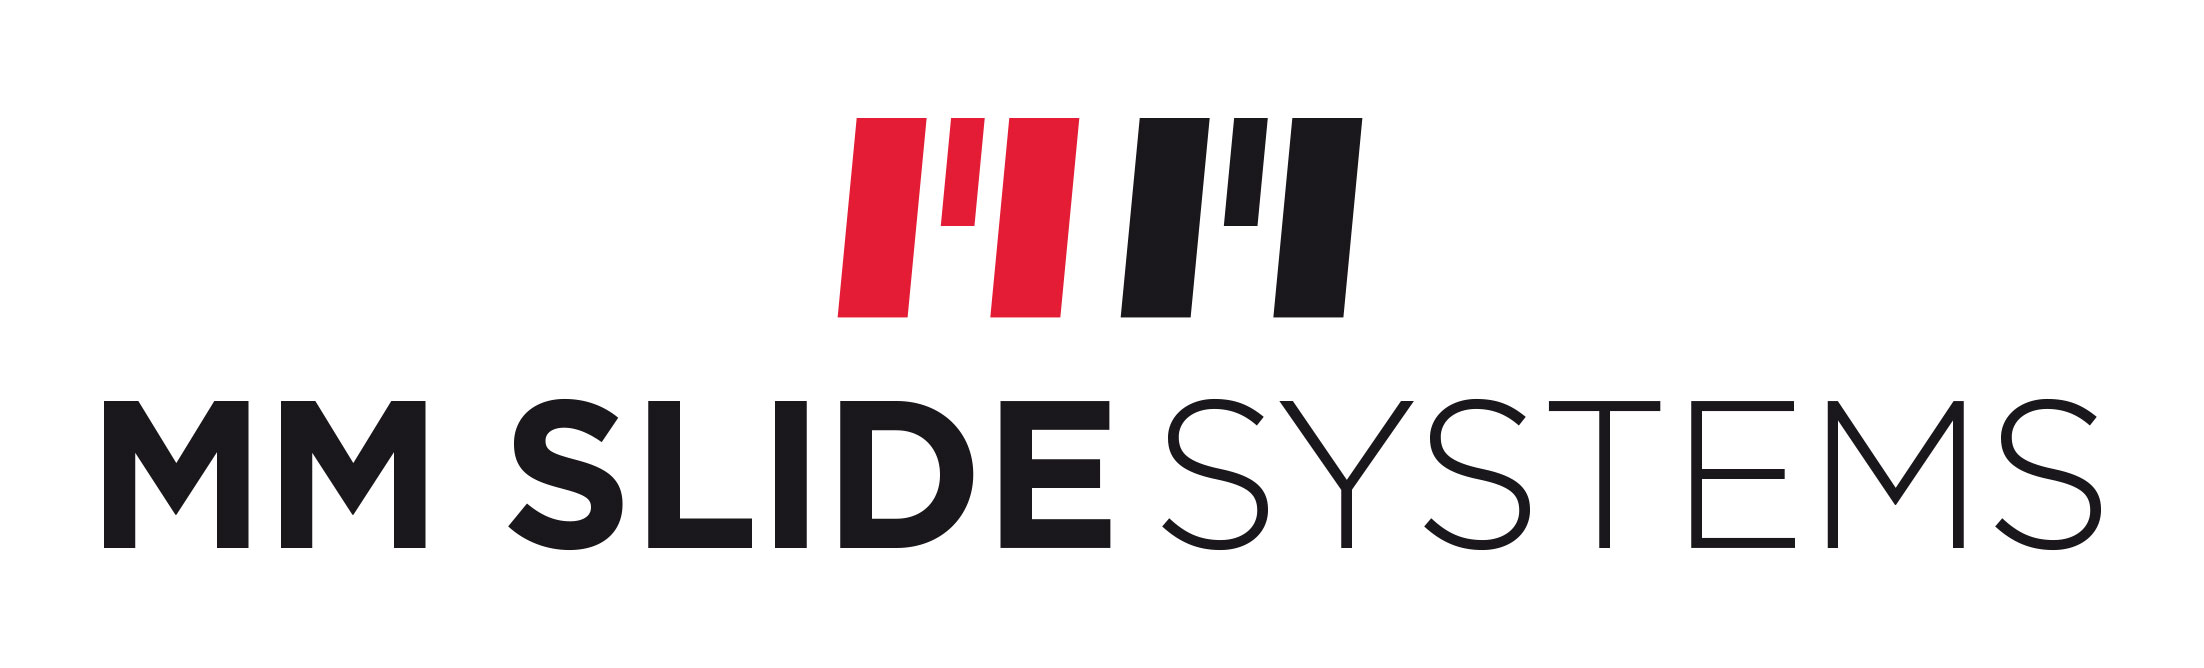 mm-slidesystems